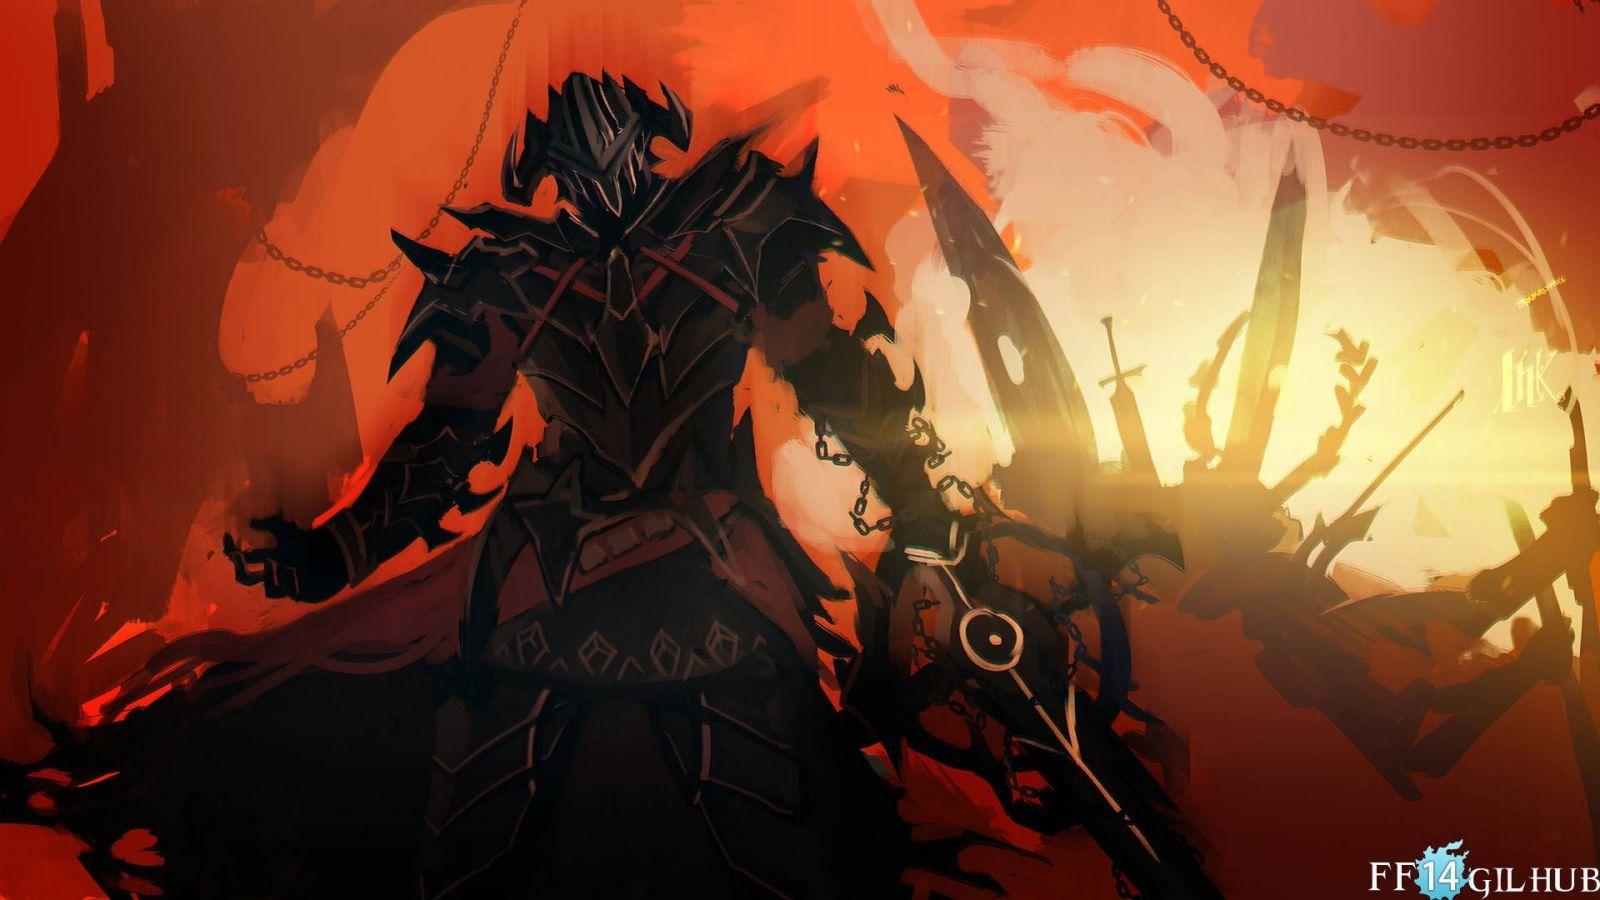 Ffxiv Dark Knight Final Fantasy Art Dark Knight Path Of